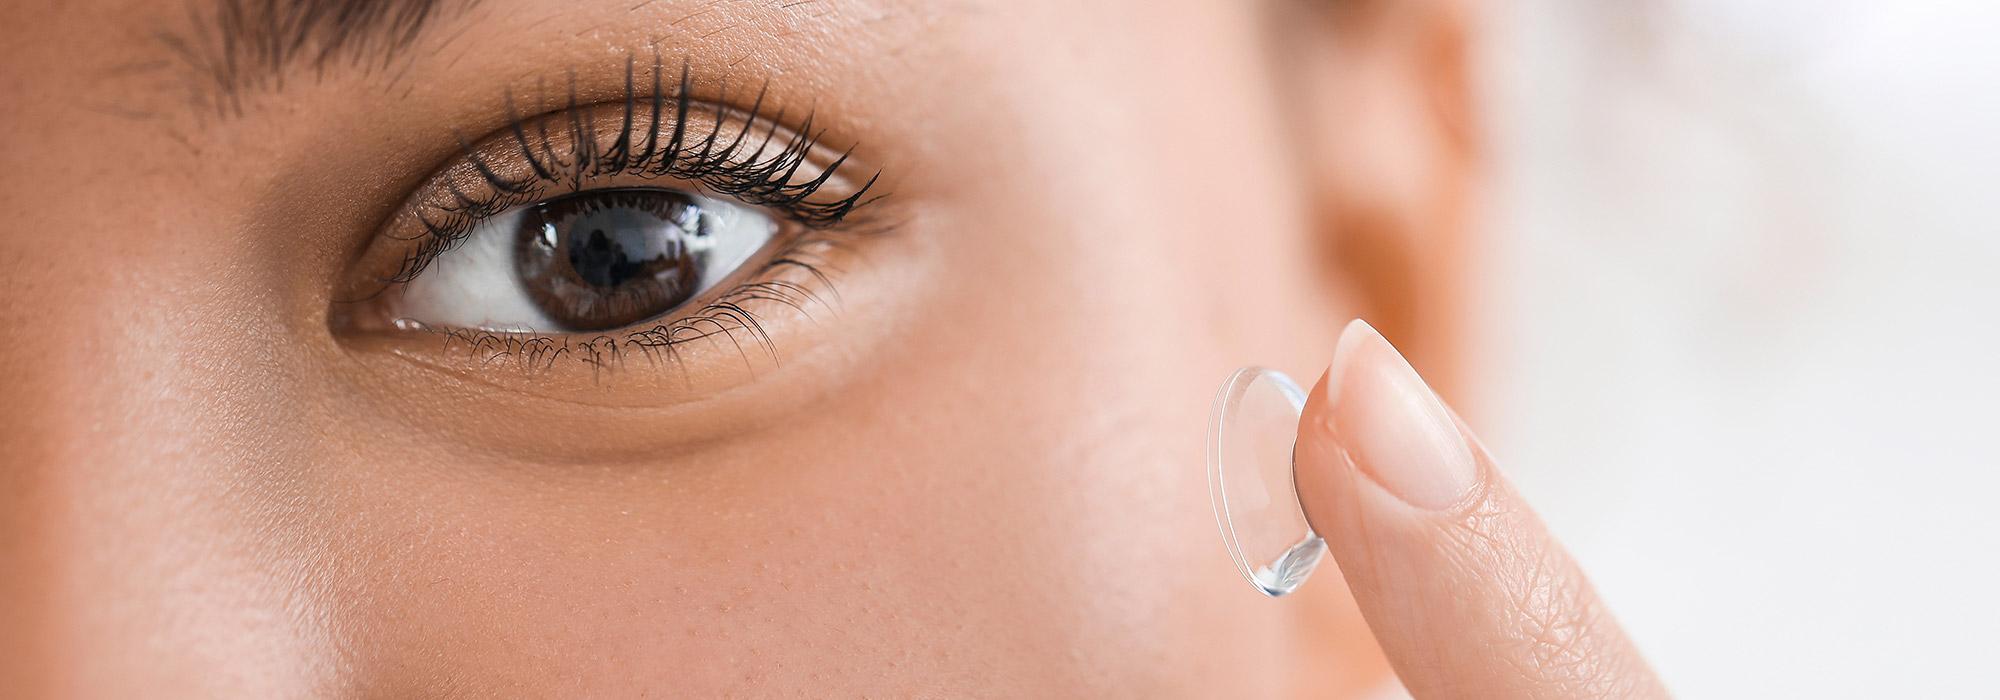 Komfortable Kontaktlinsen